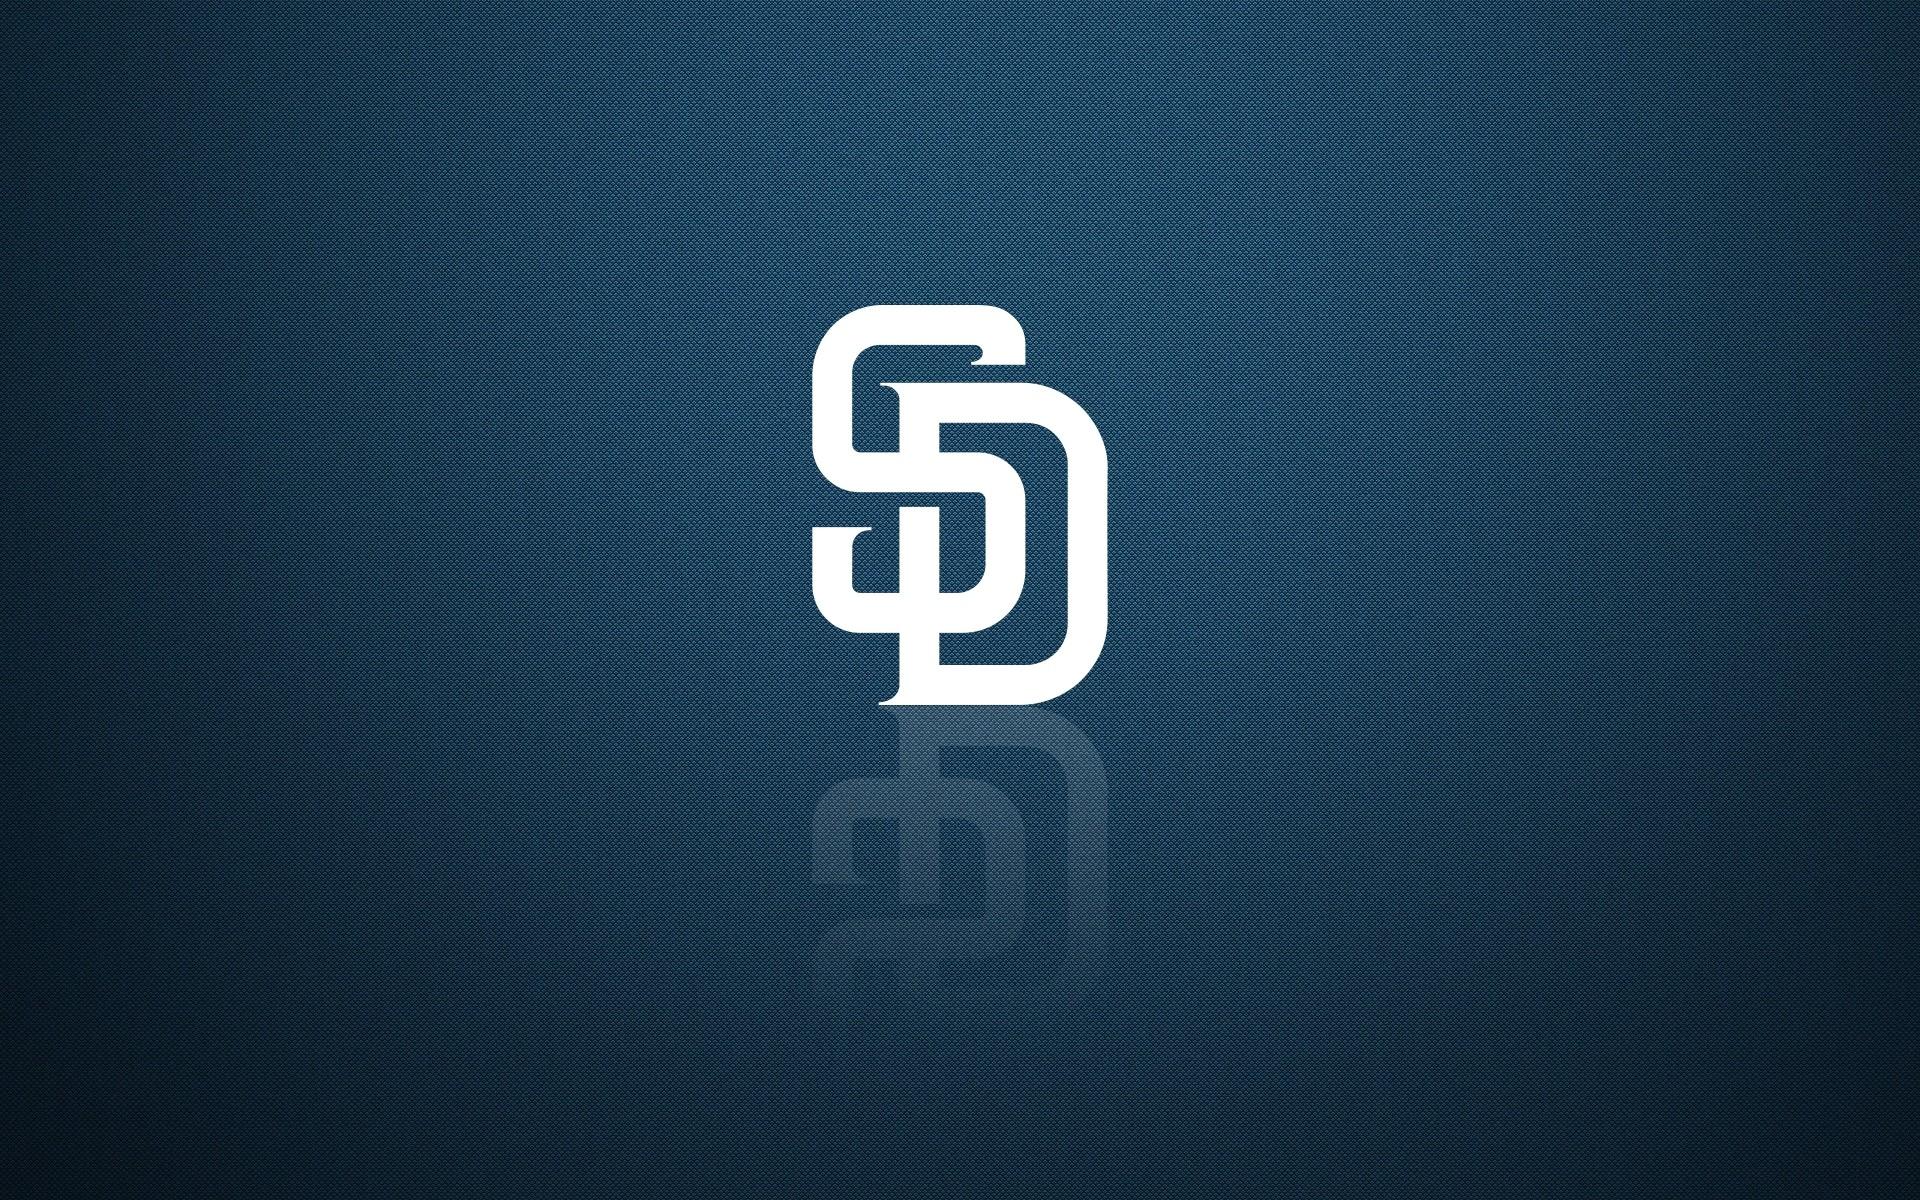 San Diego Padres wallpaper with logo, desktop background 1920×1200